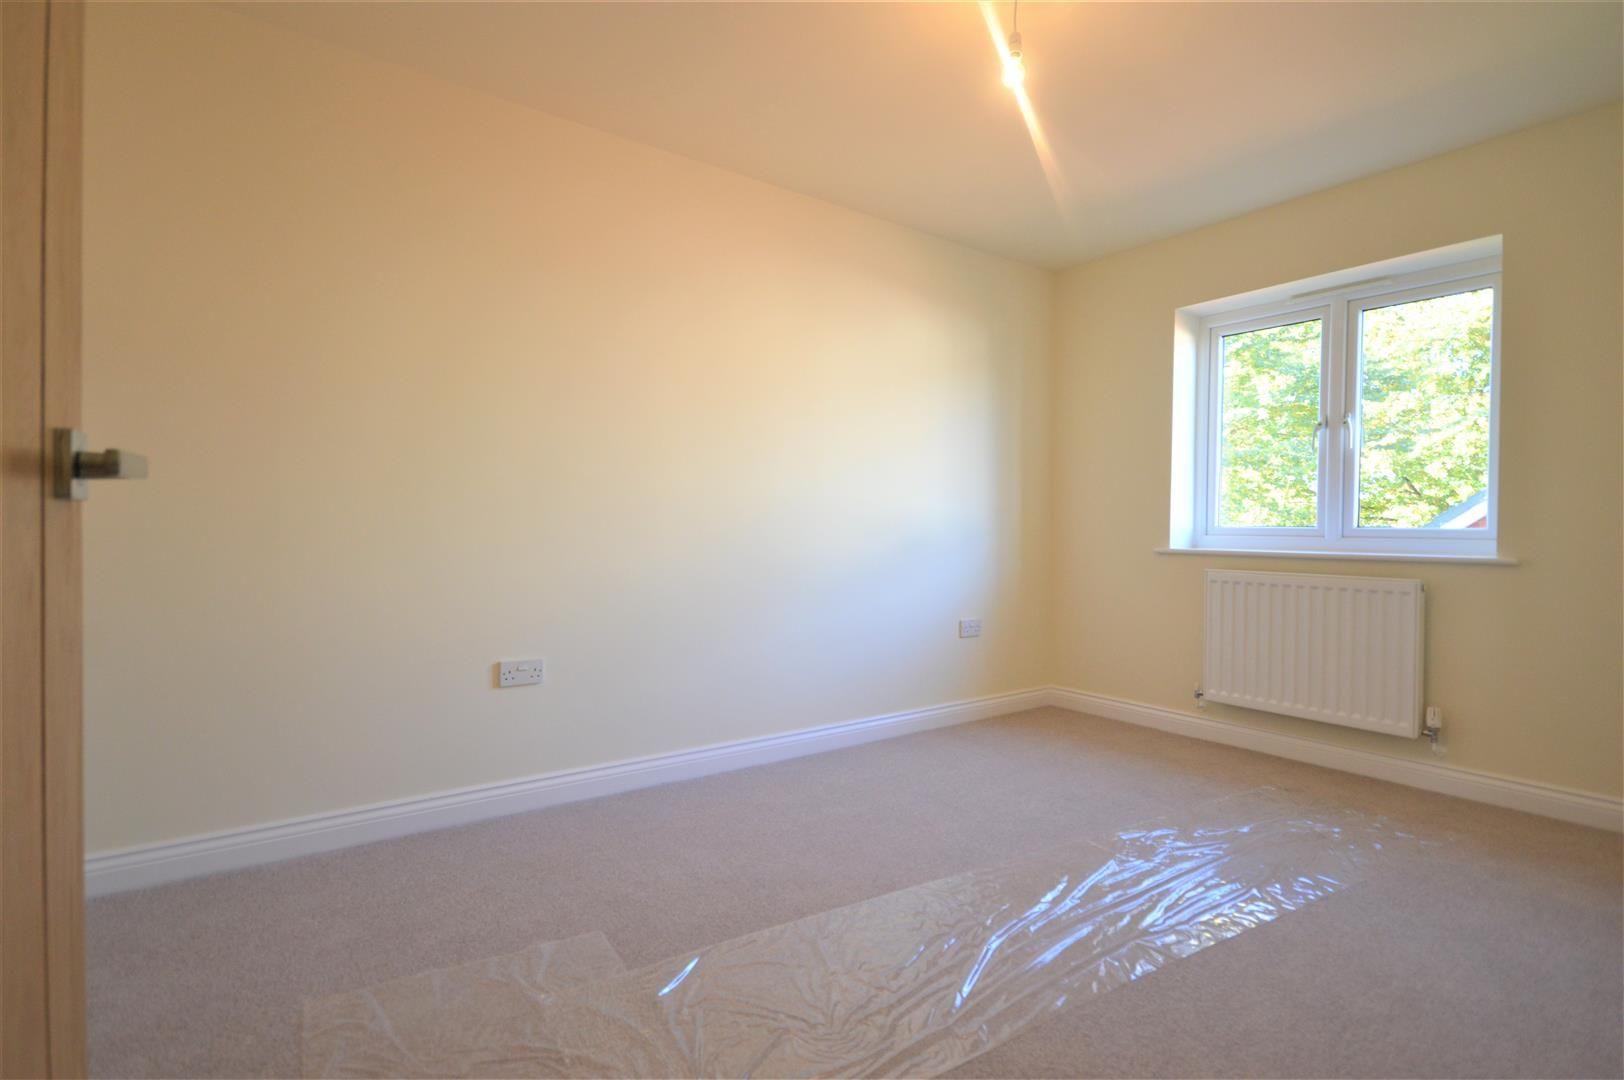 3 bed semi-detached for sale in Kingsland 5